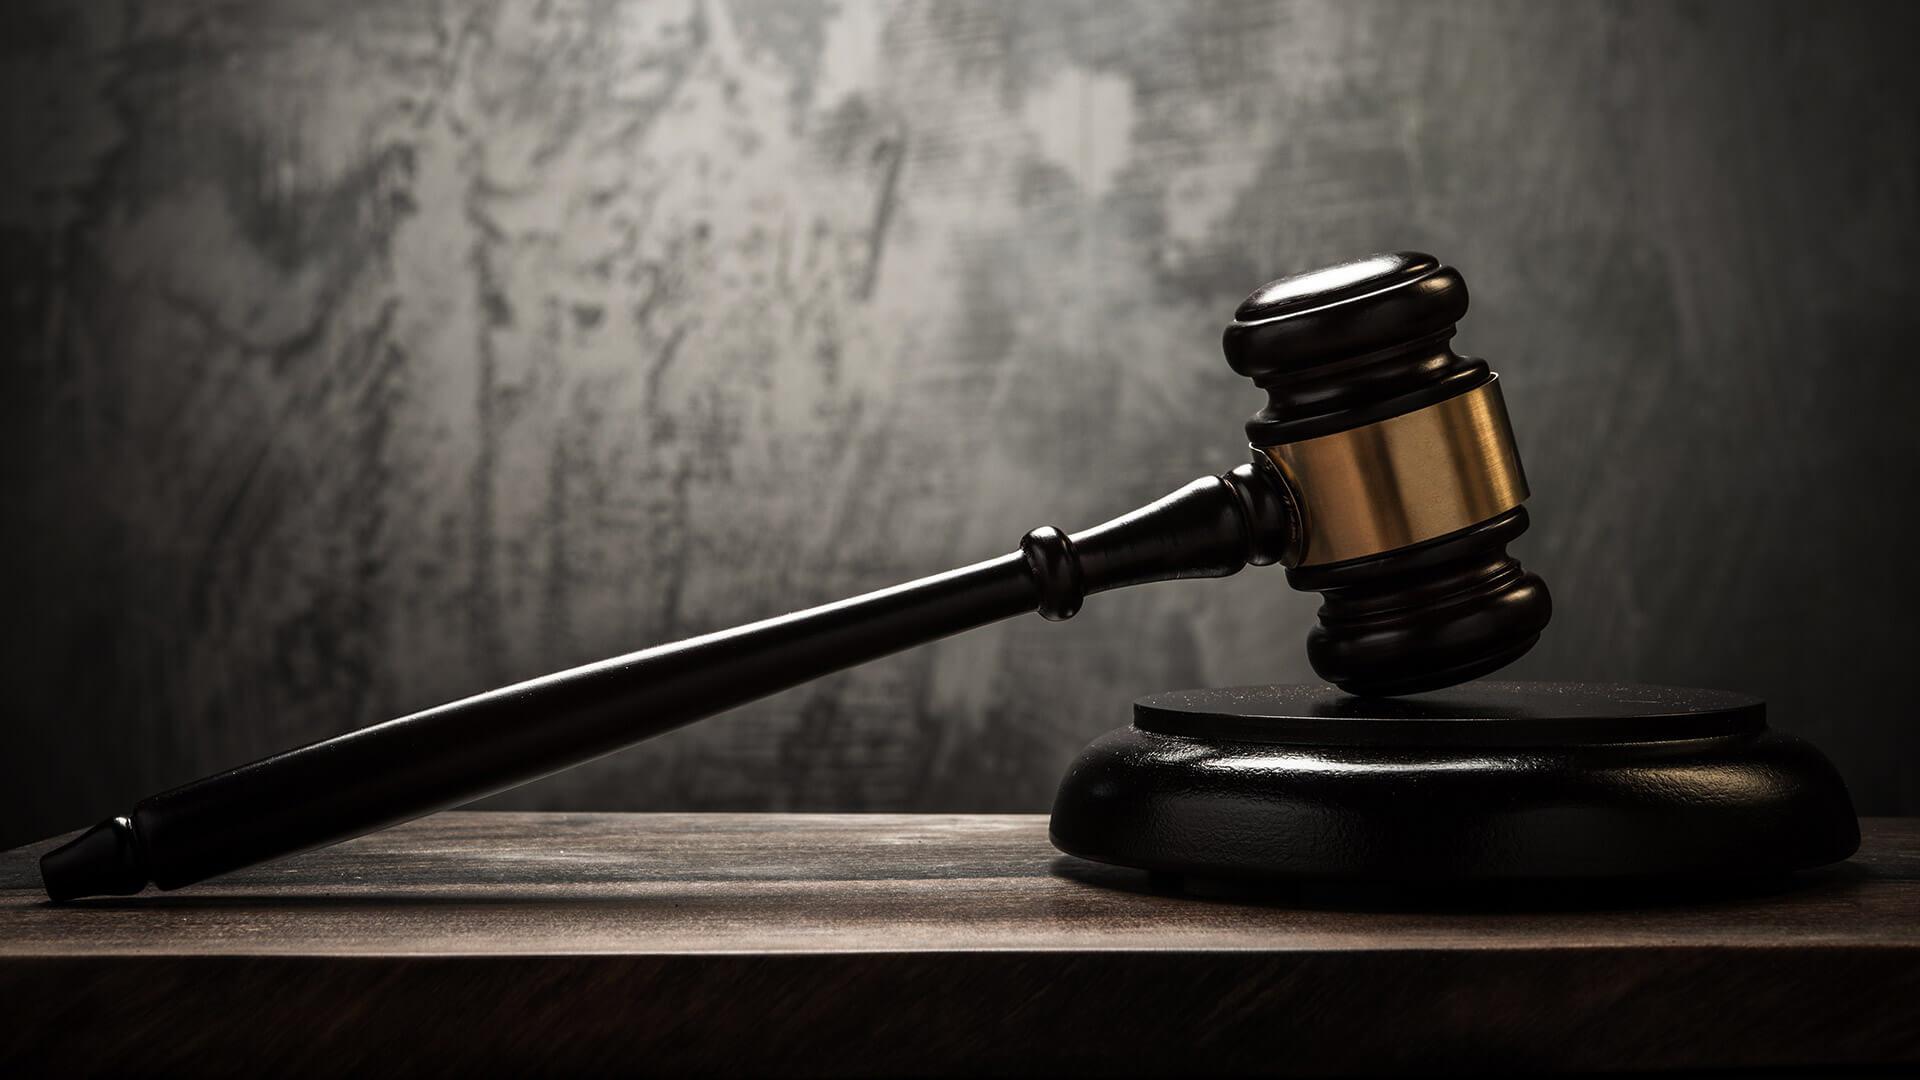 Searchmetrics wins important victory in patent infringement lawsuit